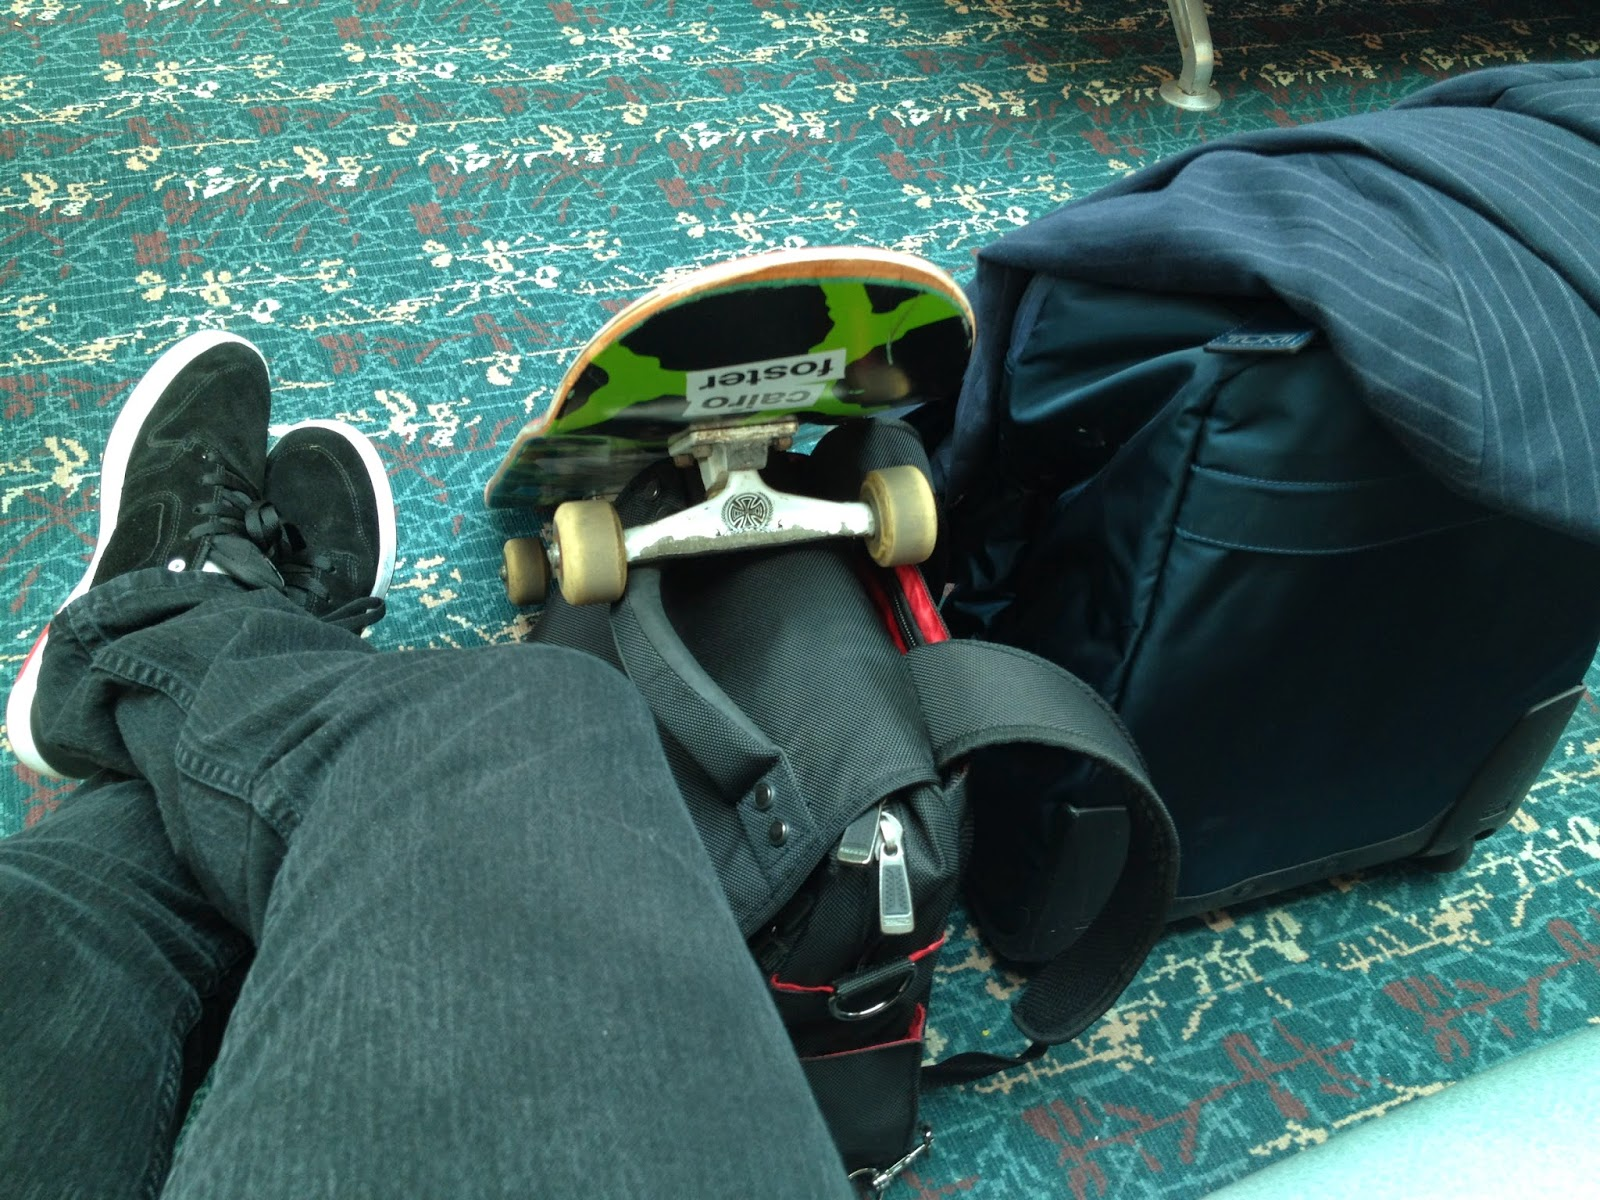 Travel Skateboard Blazer Computer